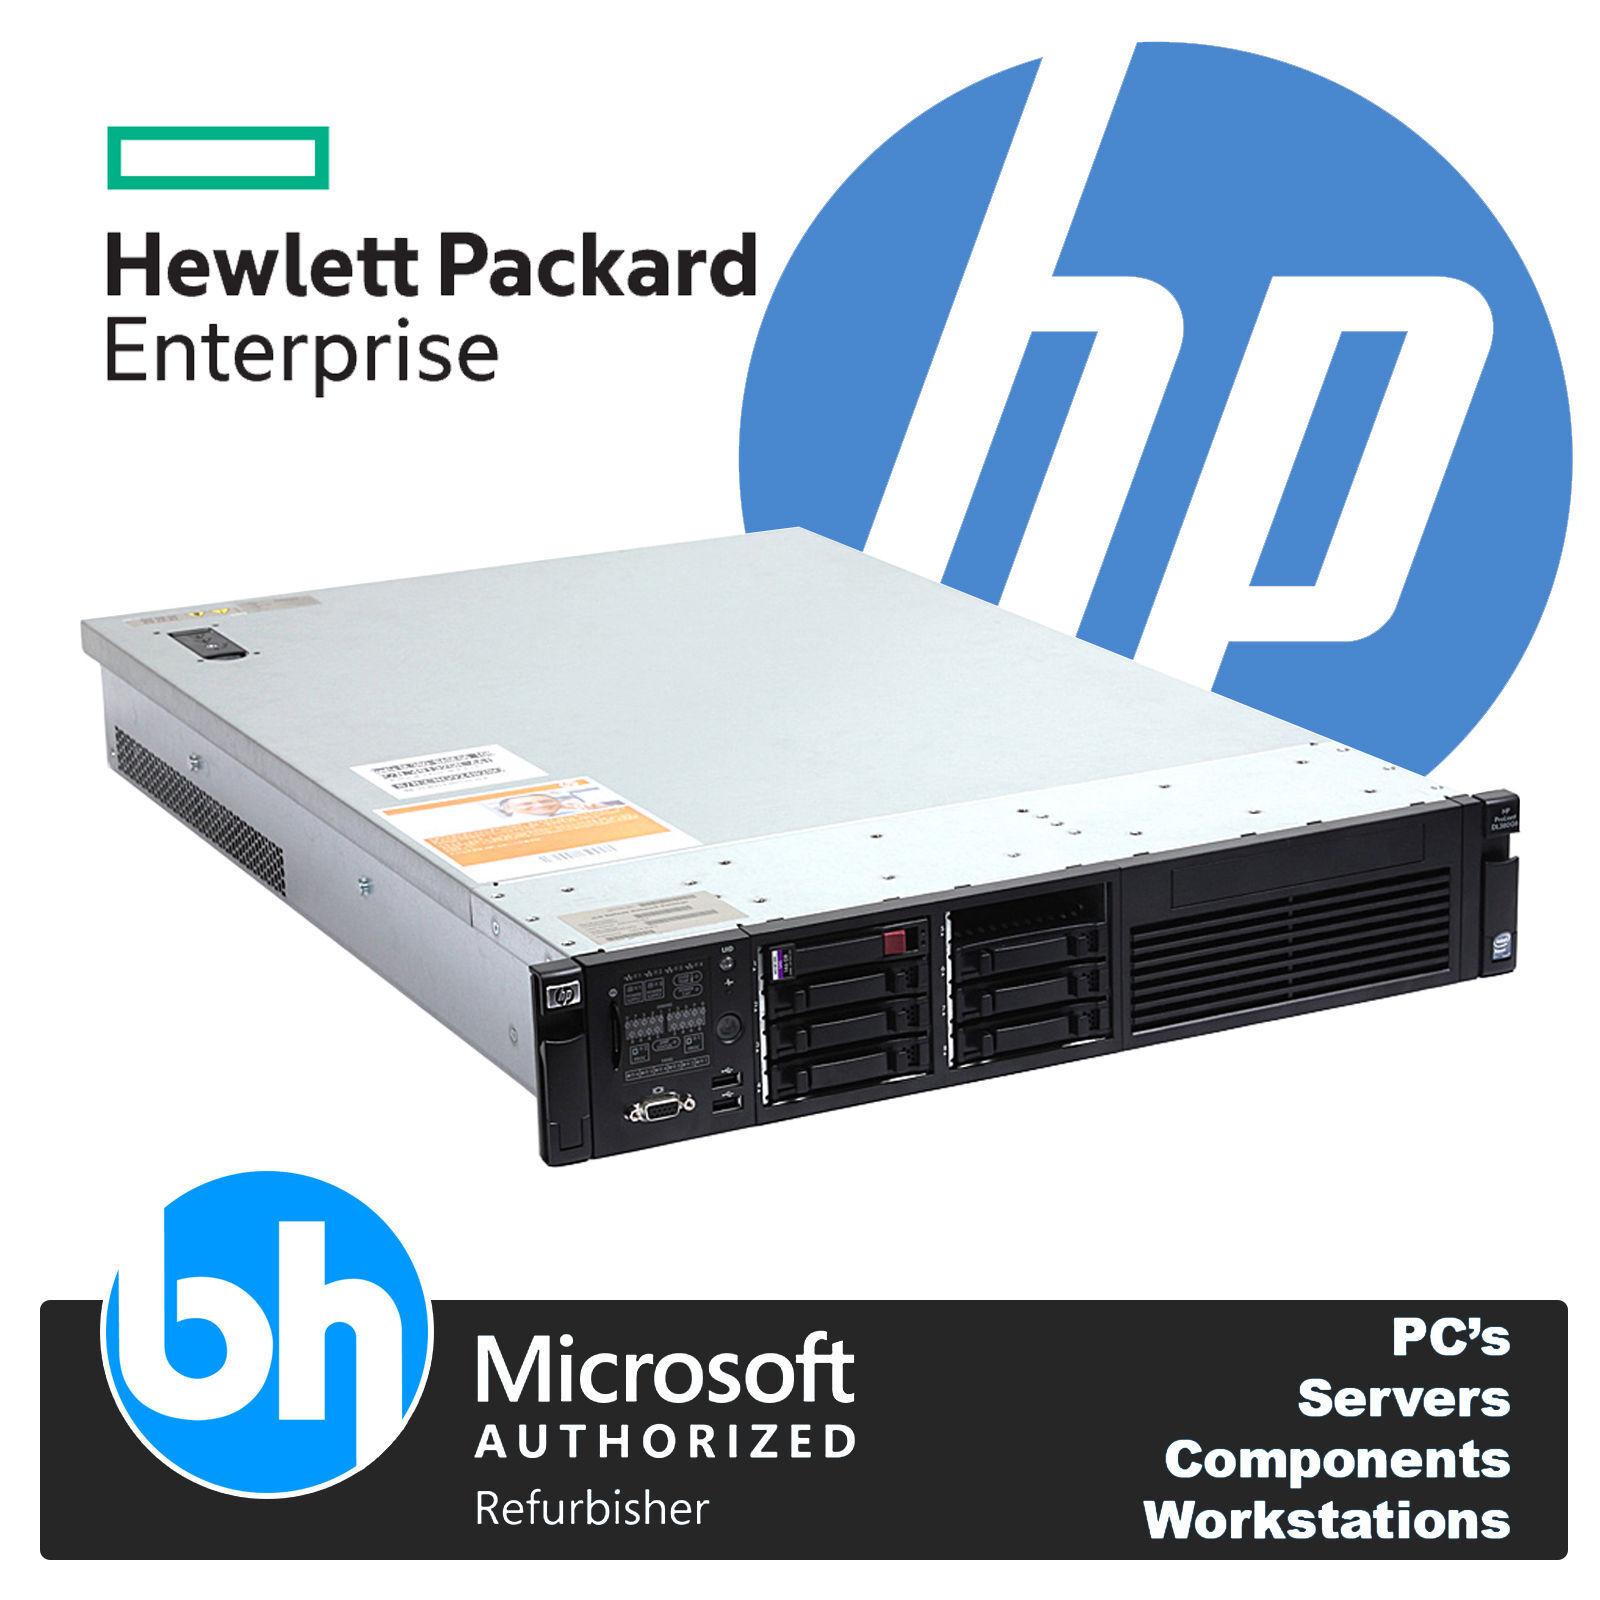 HP ProLiant DL380 G6 Configurable Used Rack Server 2x Quad / Hex Xeon Cores 64GB